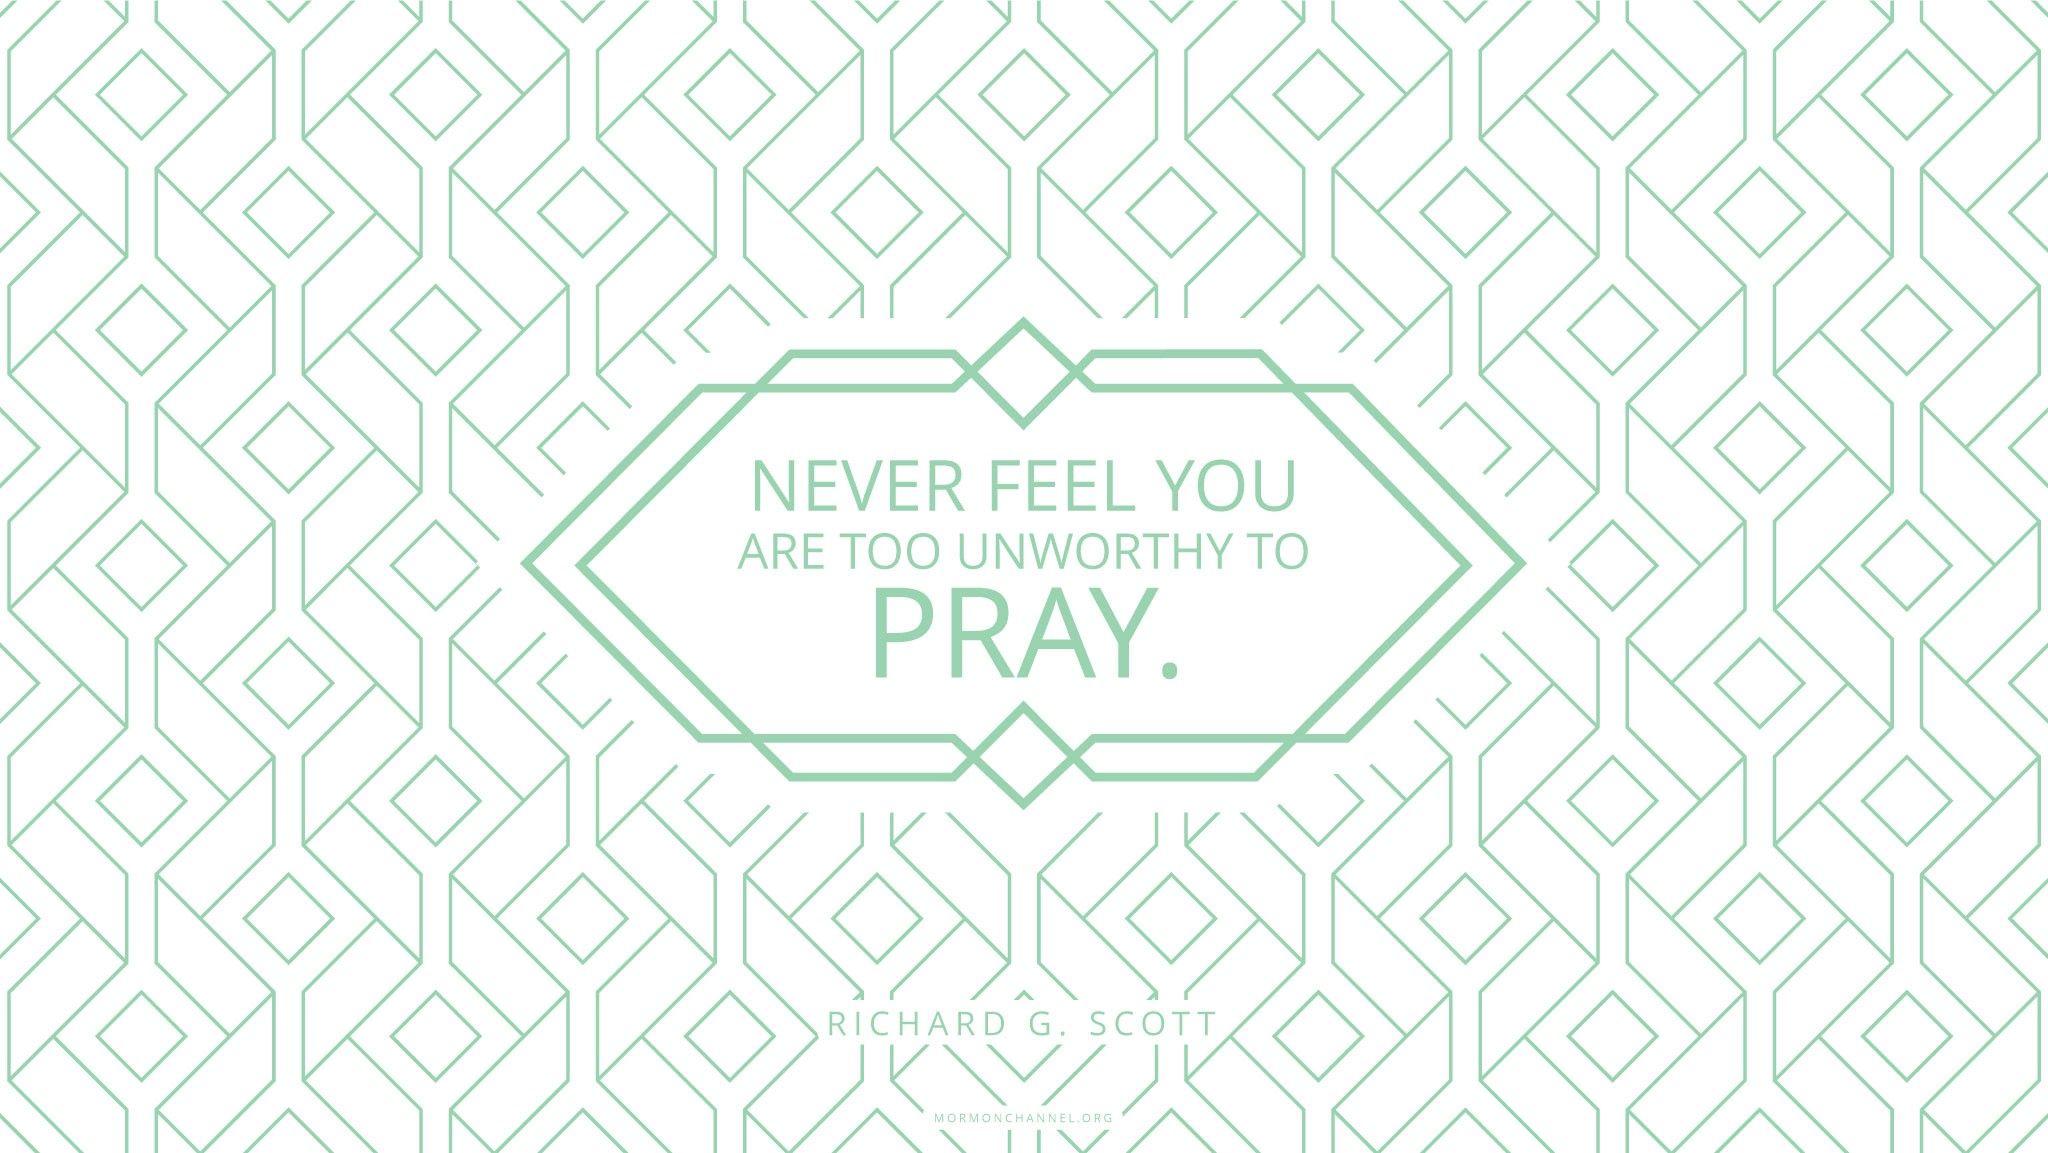 """Never feel you are too unworthy to pray.""—Elder Richard G. Scott, ""Using the Supernal Gift of Prayer"""